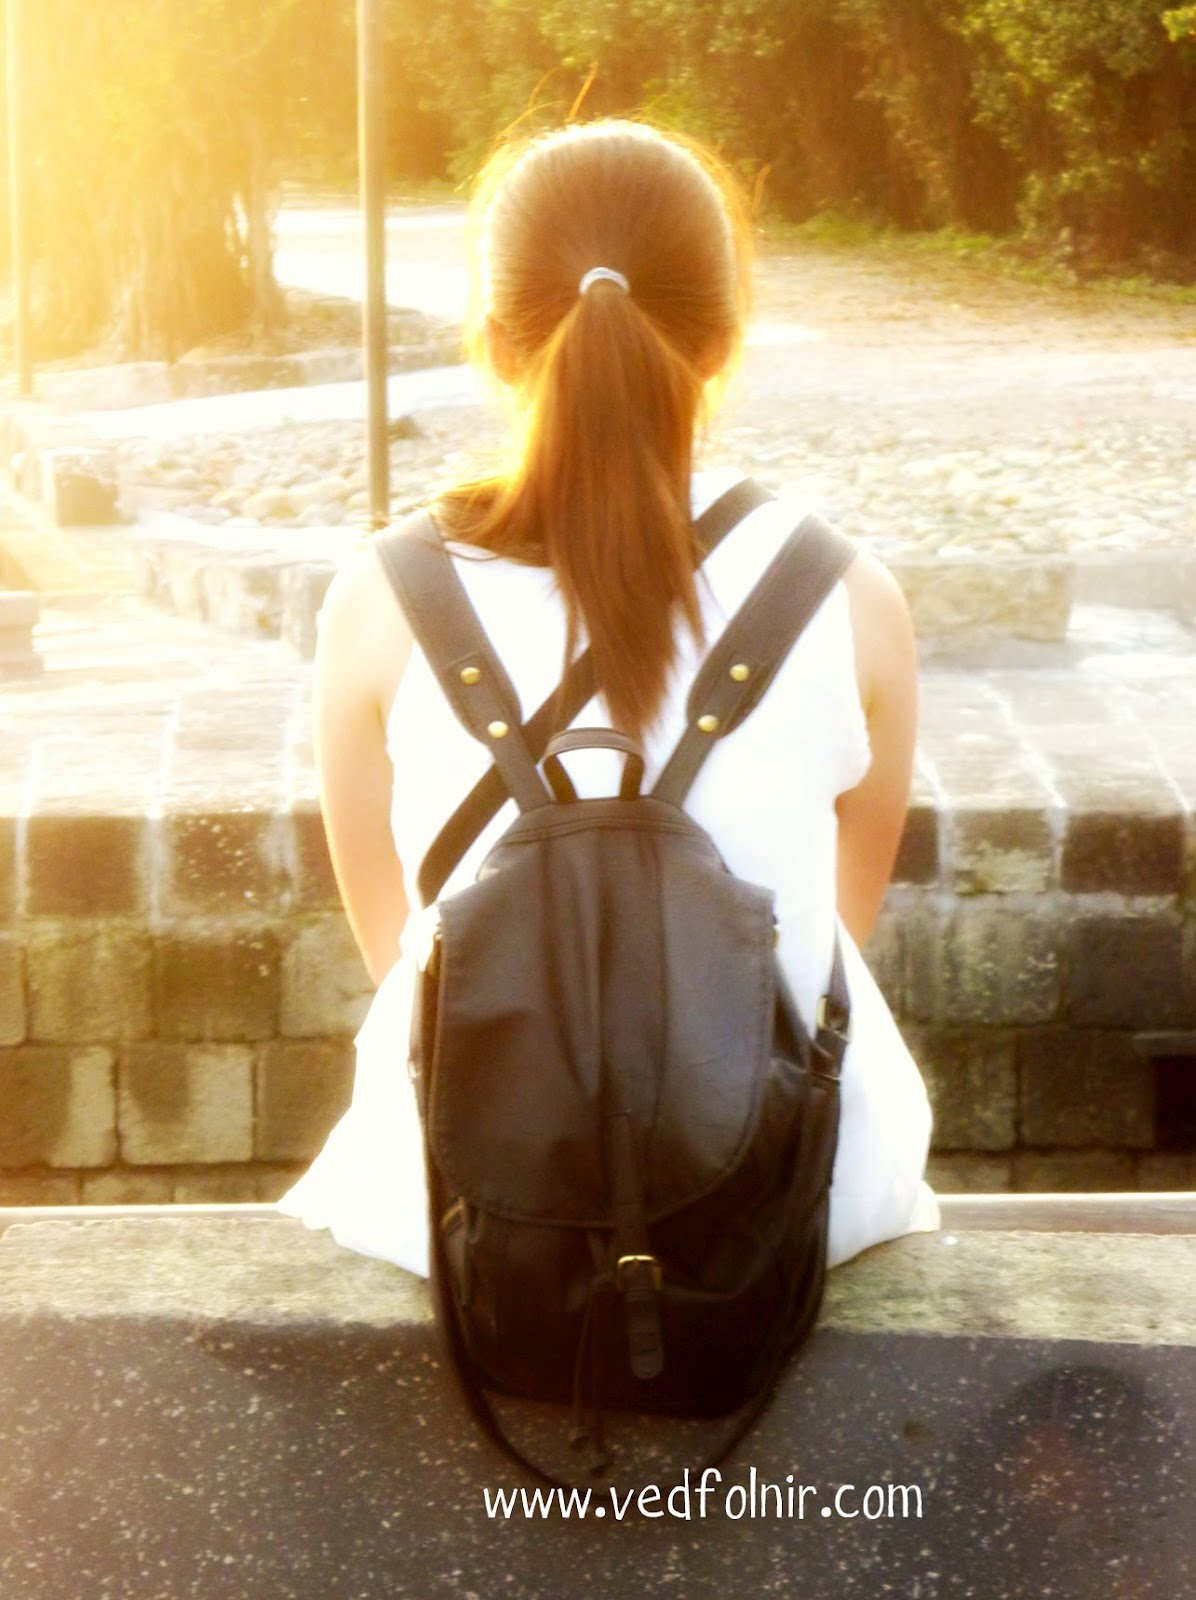 淡水遊記/在河岸邊遇見的陽光女孩 sunny girl at tamsui riversidr 1